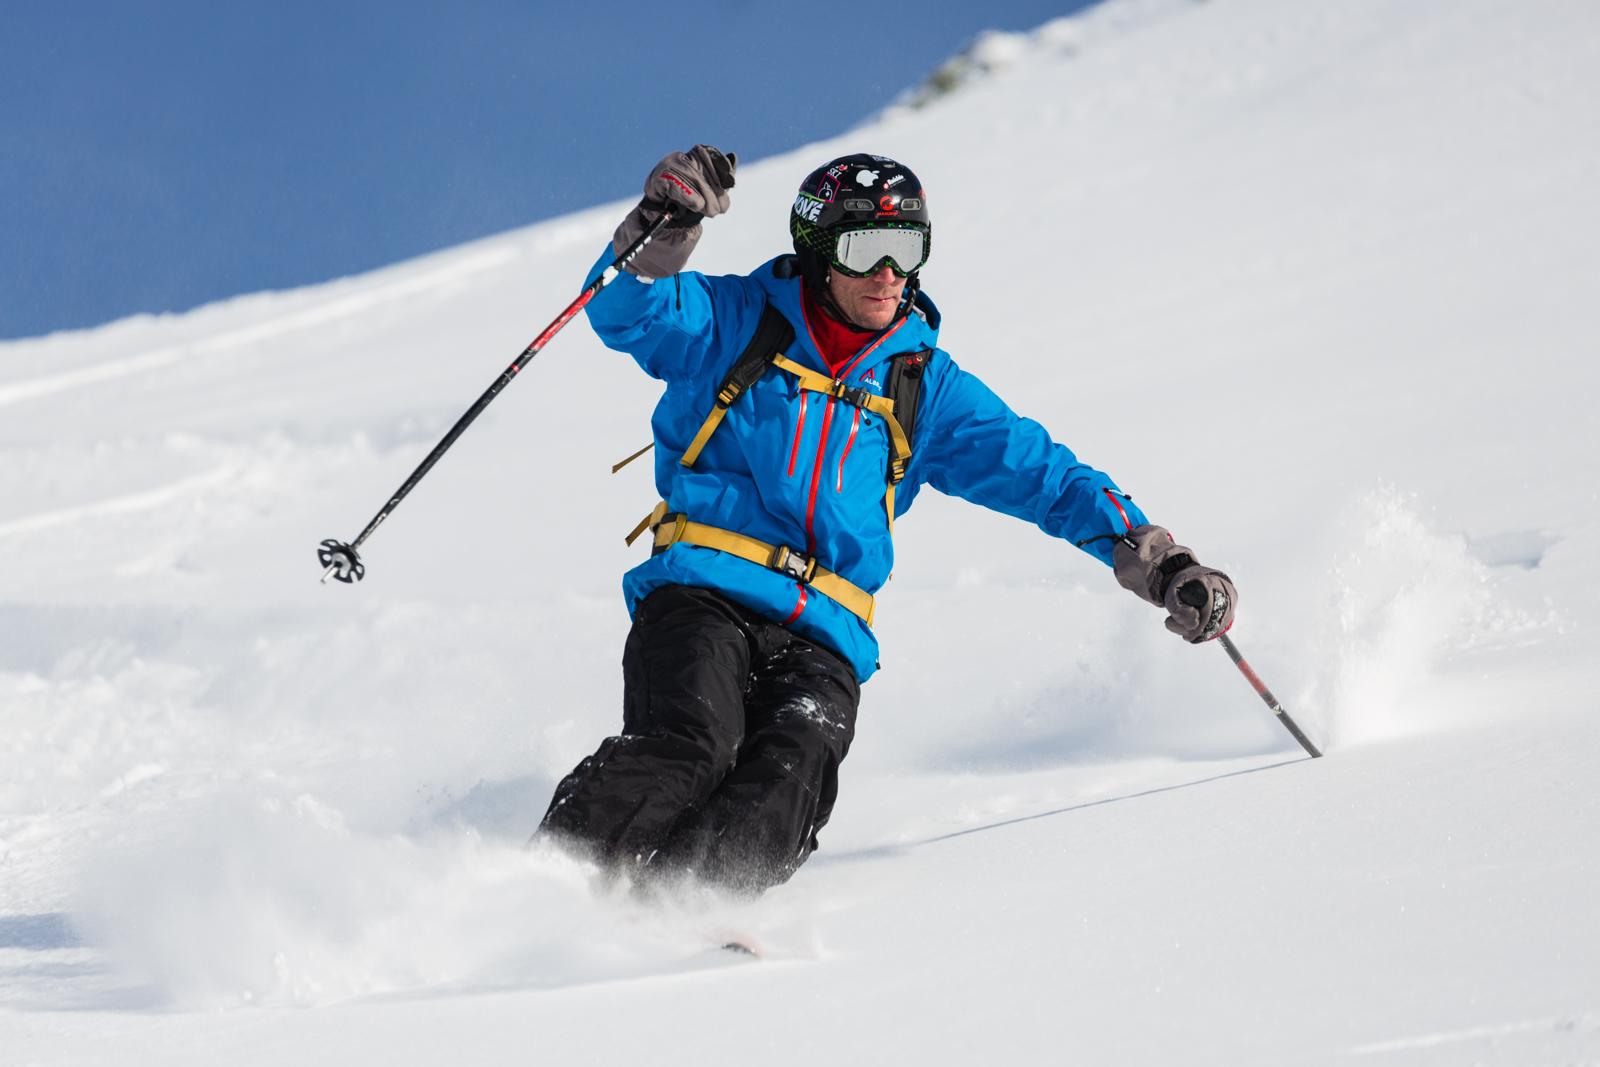 Ski Club Nax